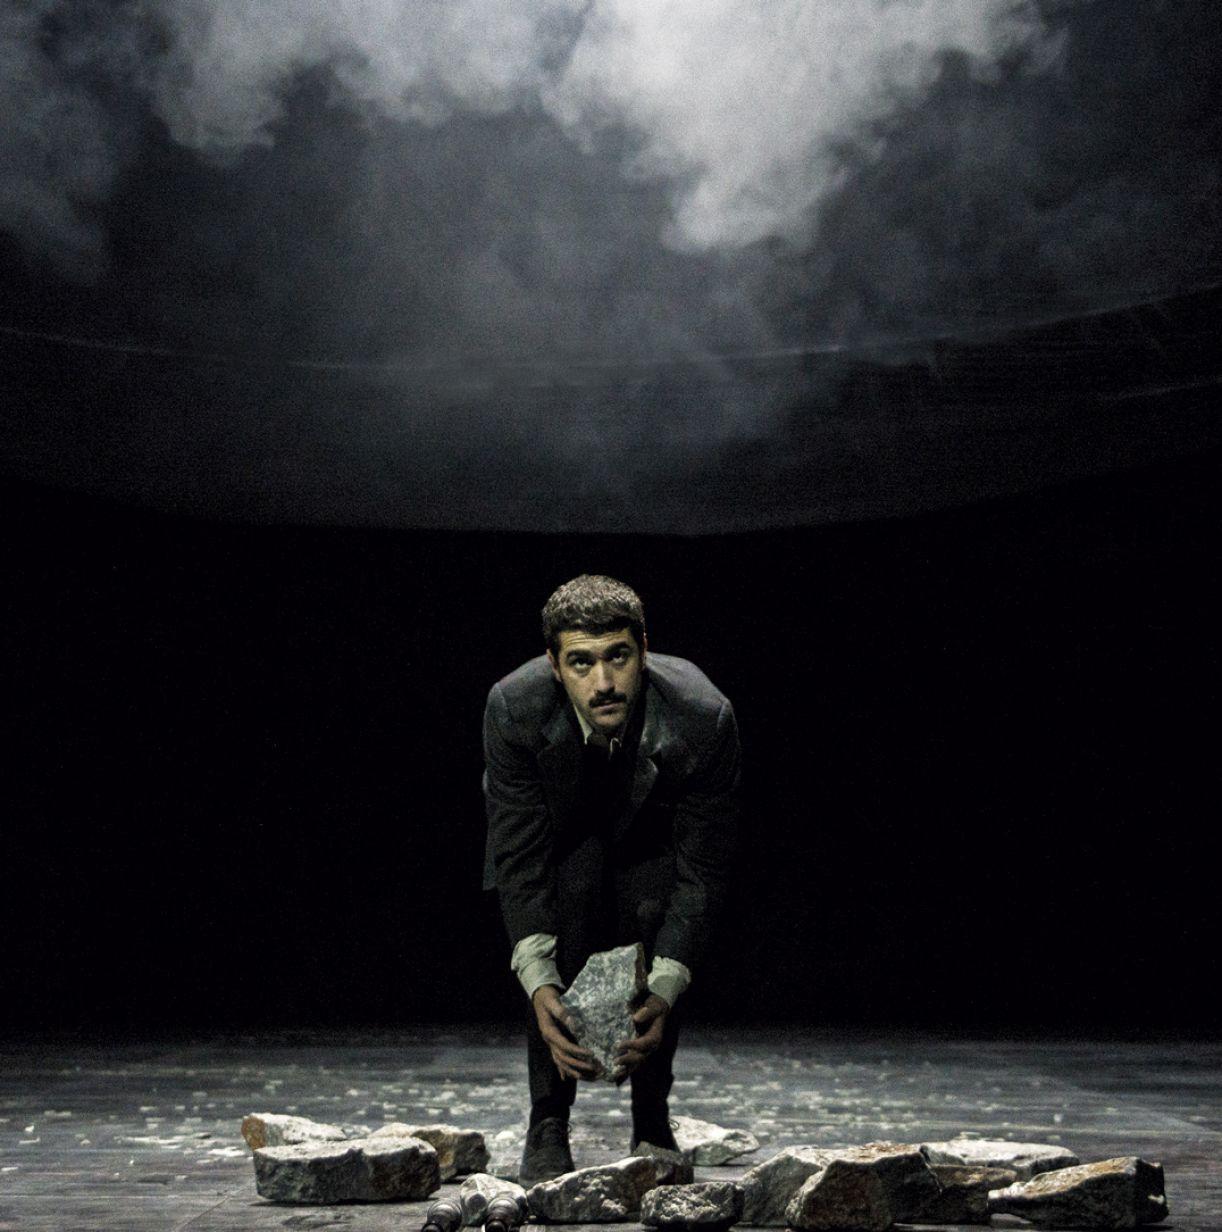 Mito de Sísifo motiva a obra 'Still Life', de Dimitris Papaioannou